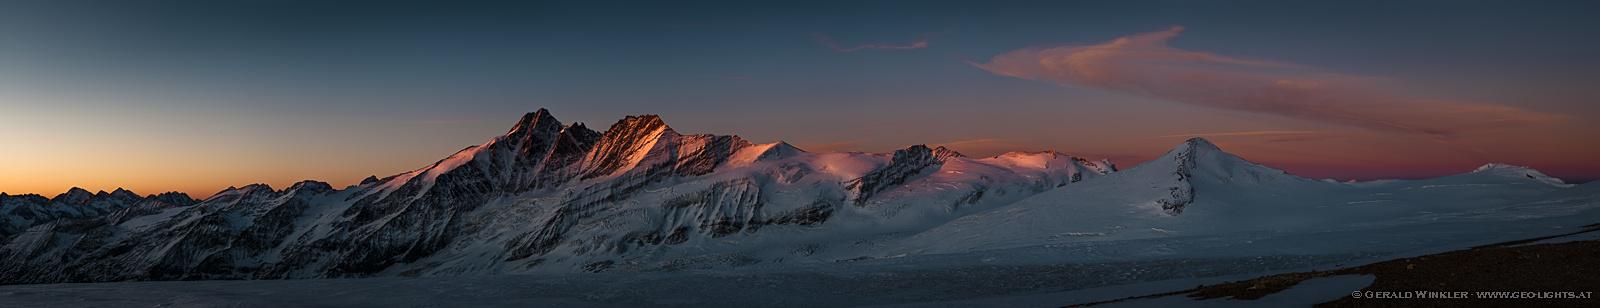 pano_glockner-sunrise_3833-foto.at